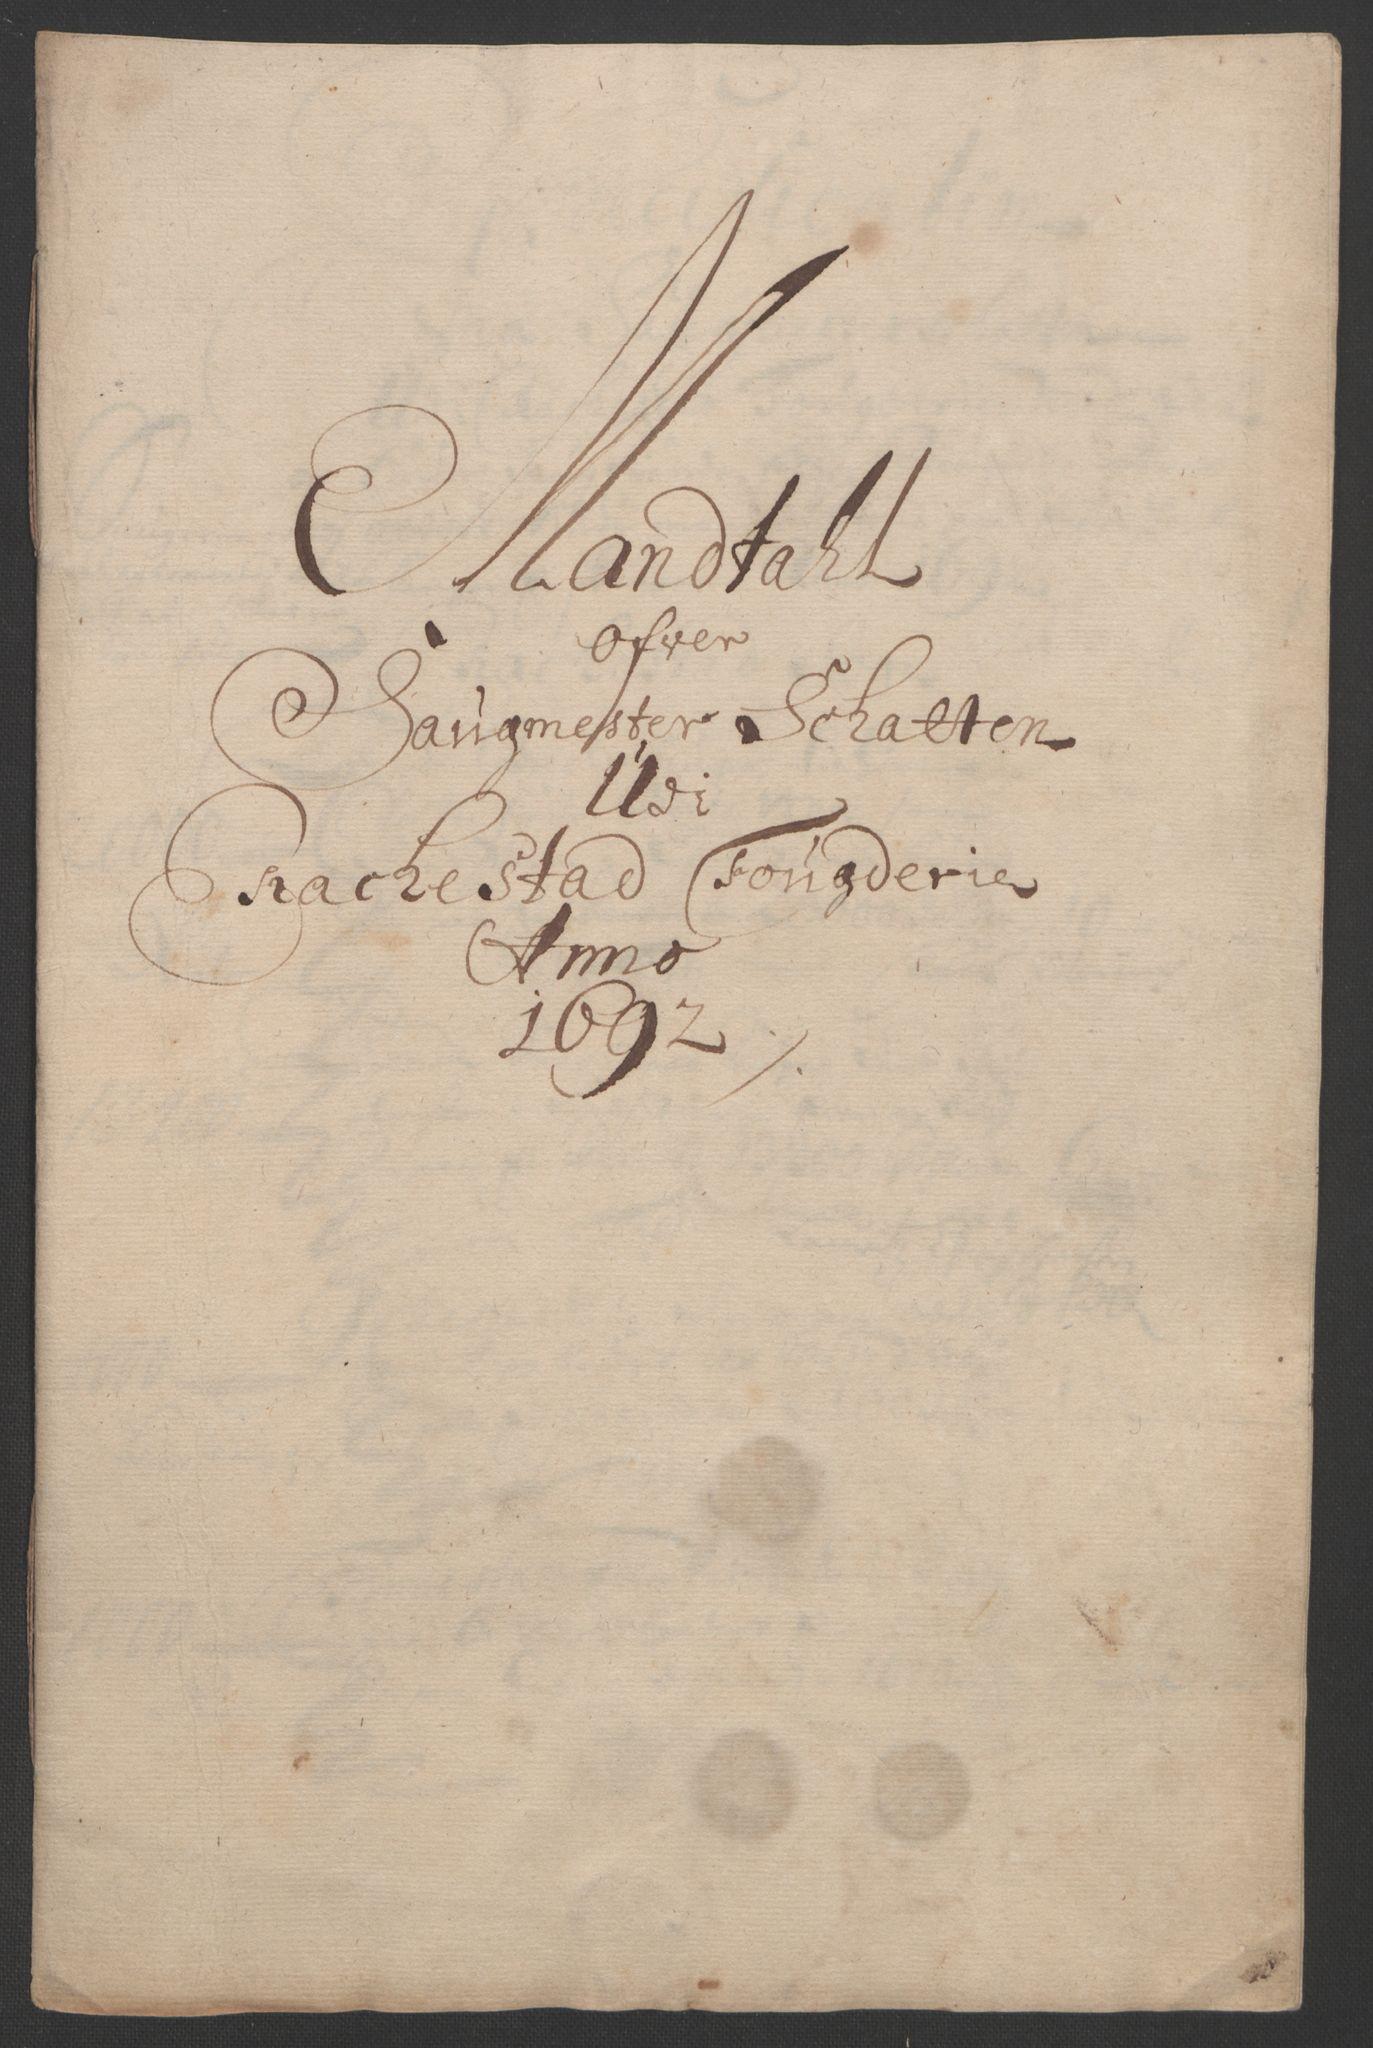 RA, Rentekammeret inntil 1814, Reviderte regnskaper, Fogderegnskap, R05/L0278: Fogderegnskap Rakkestad, 1691-1693, s. 283